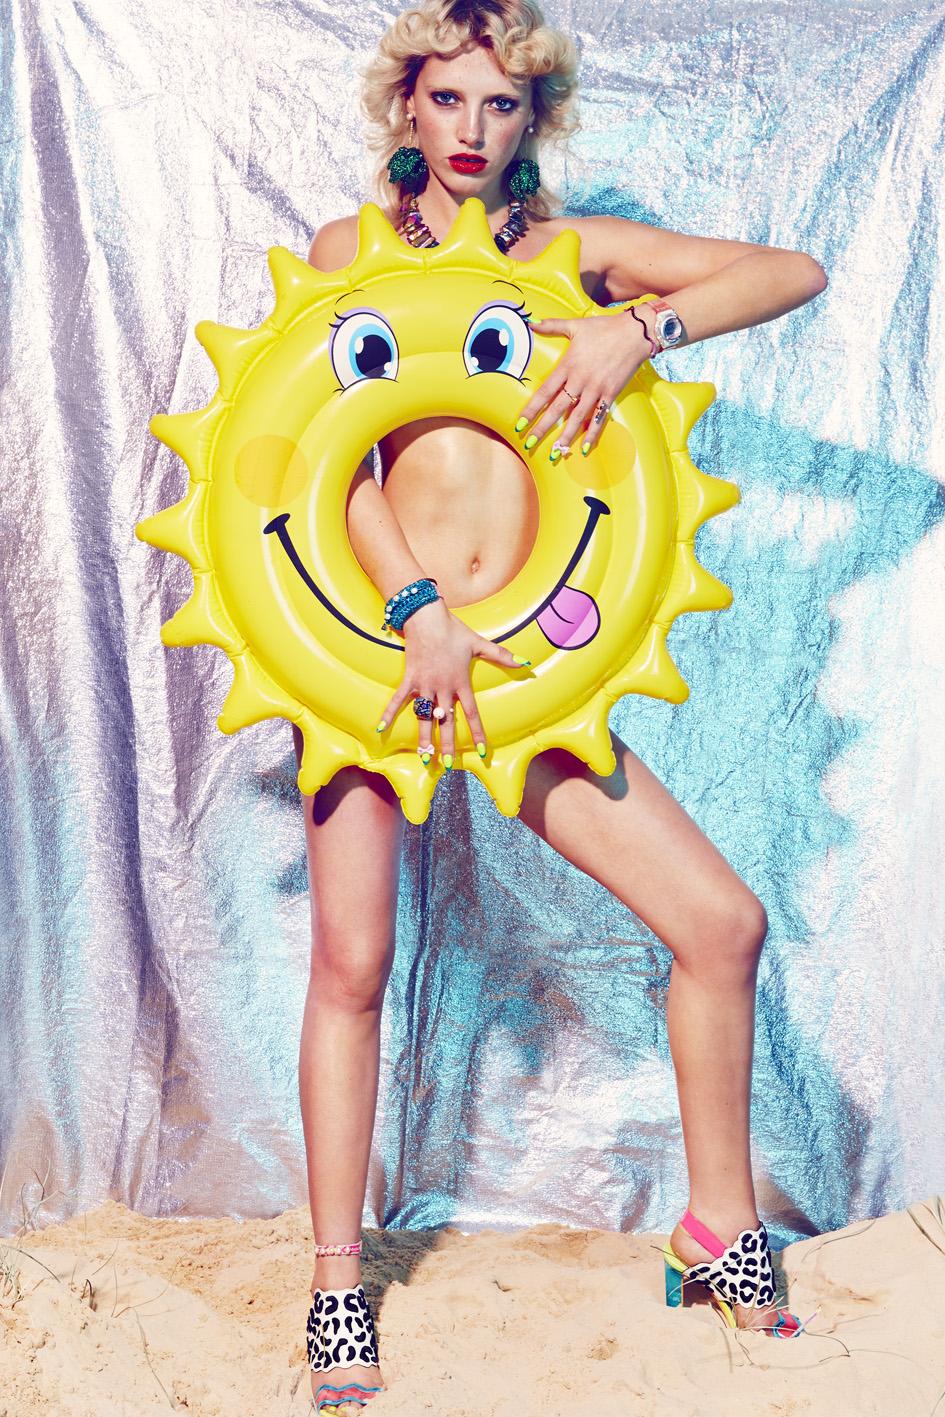 julia_kennedy_beach_baby_04.jpg